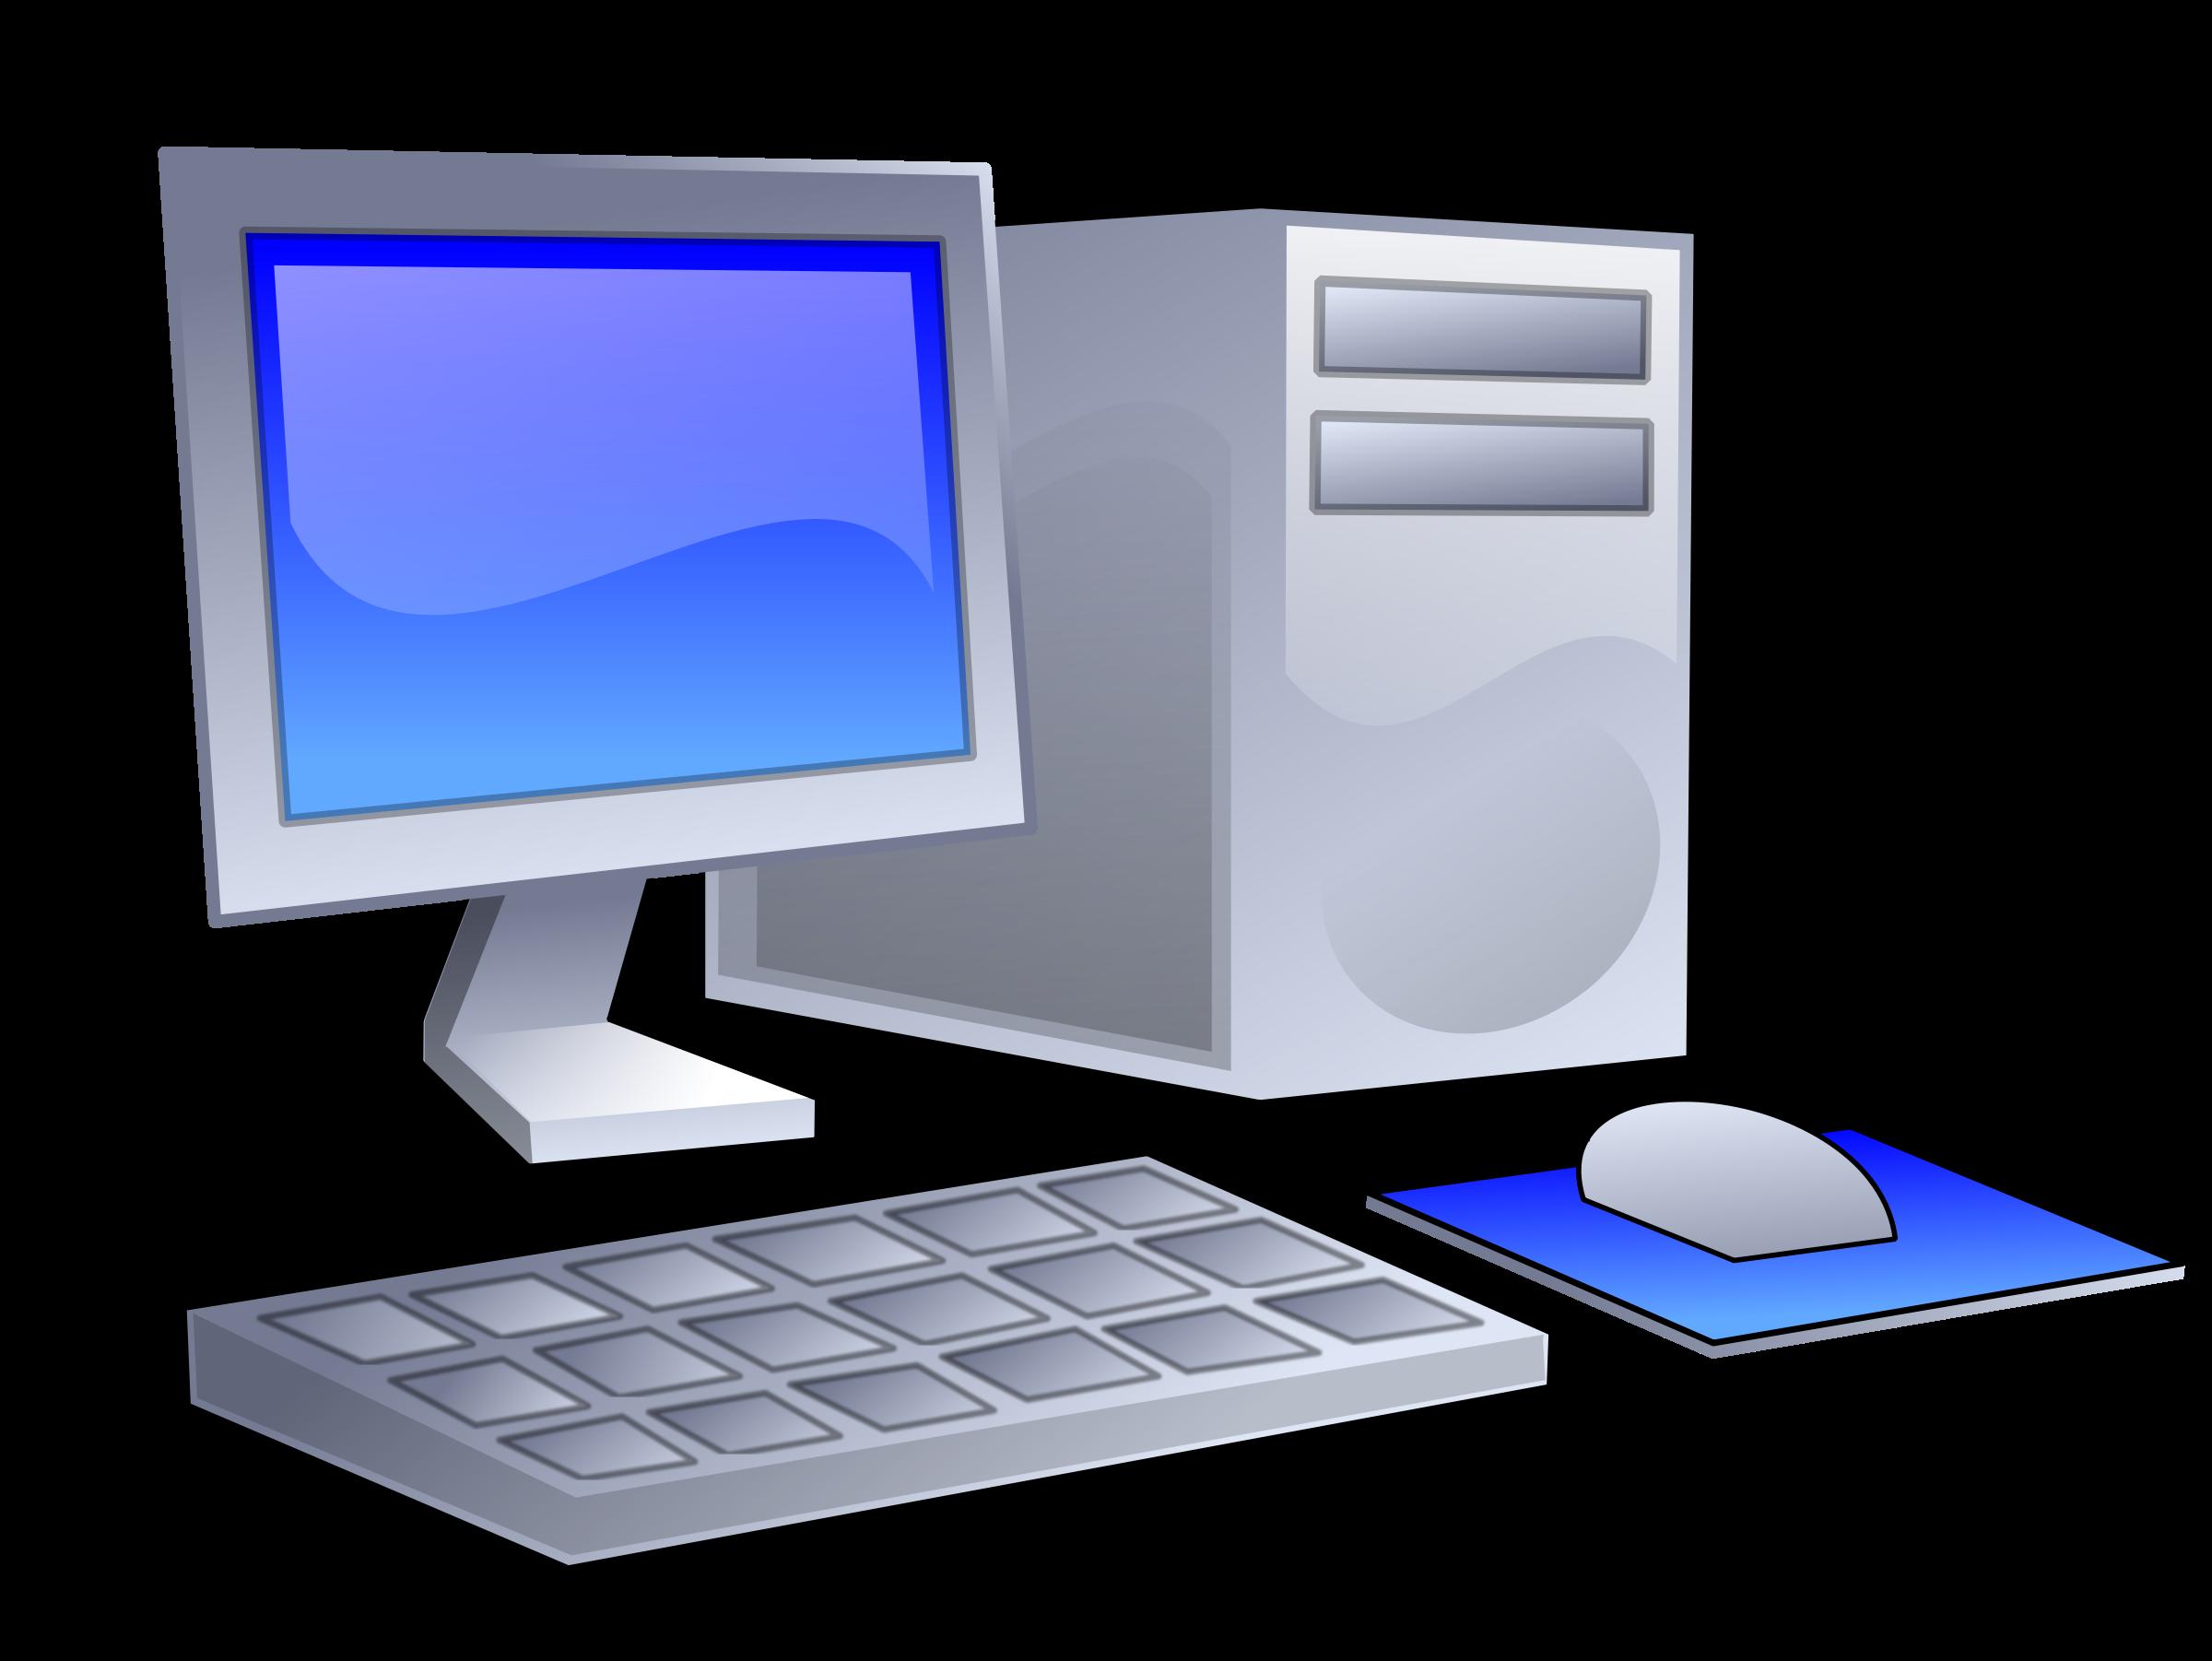 computer clipart - Computer Clipart Images